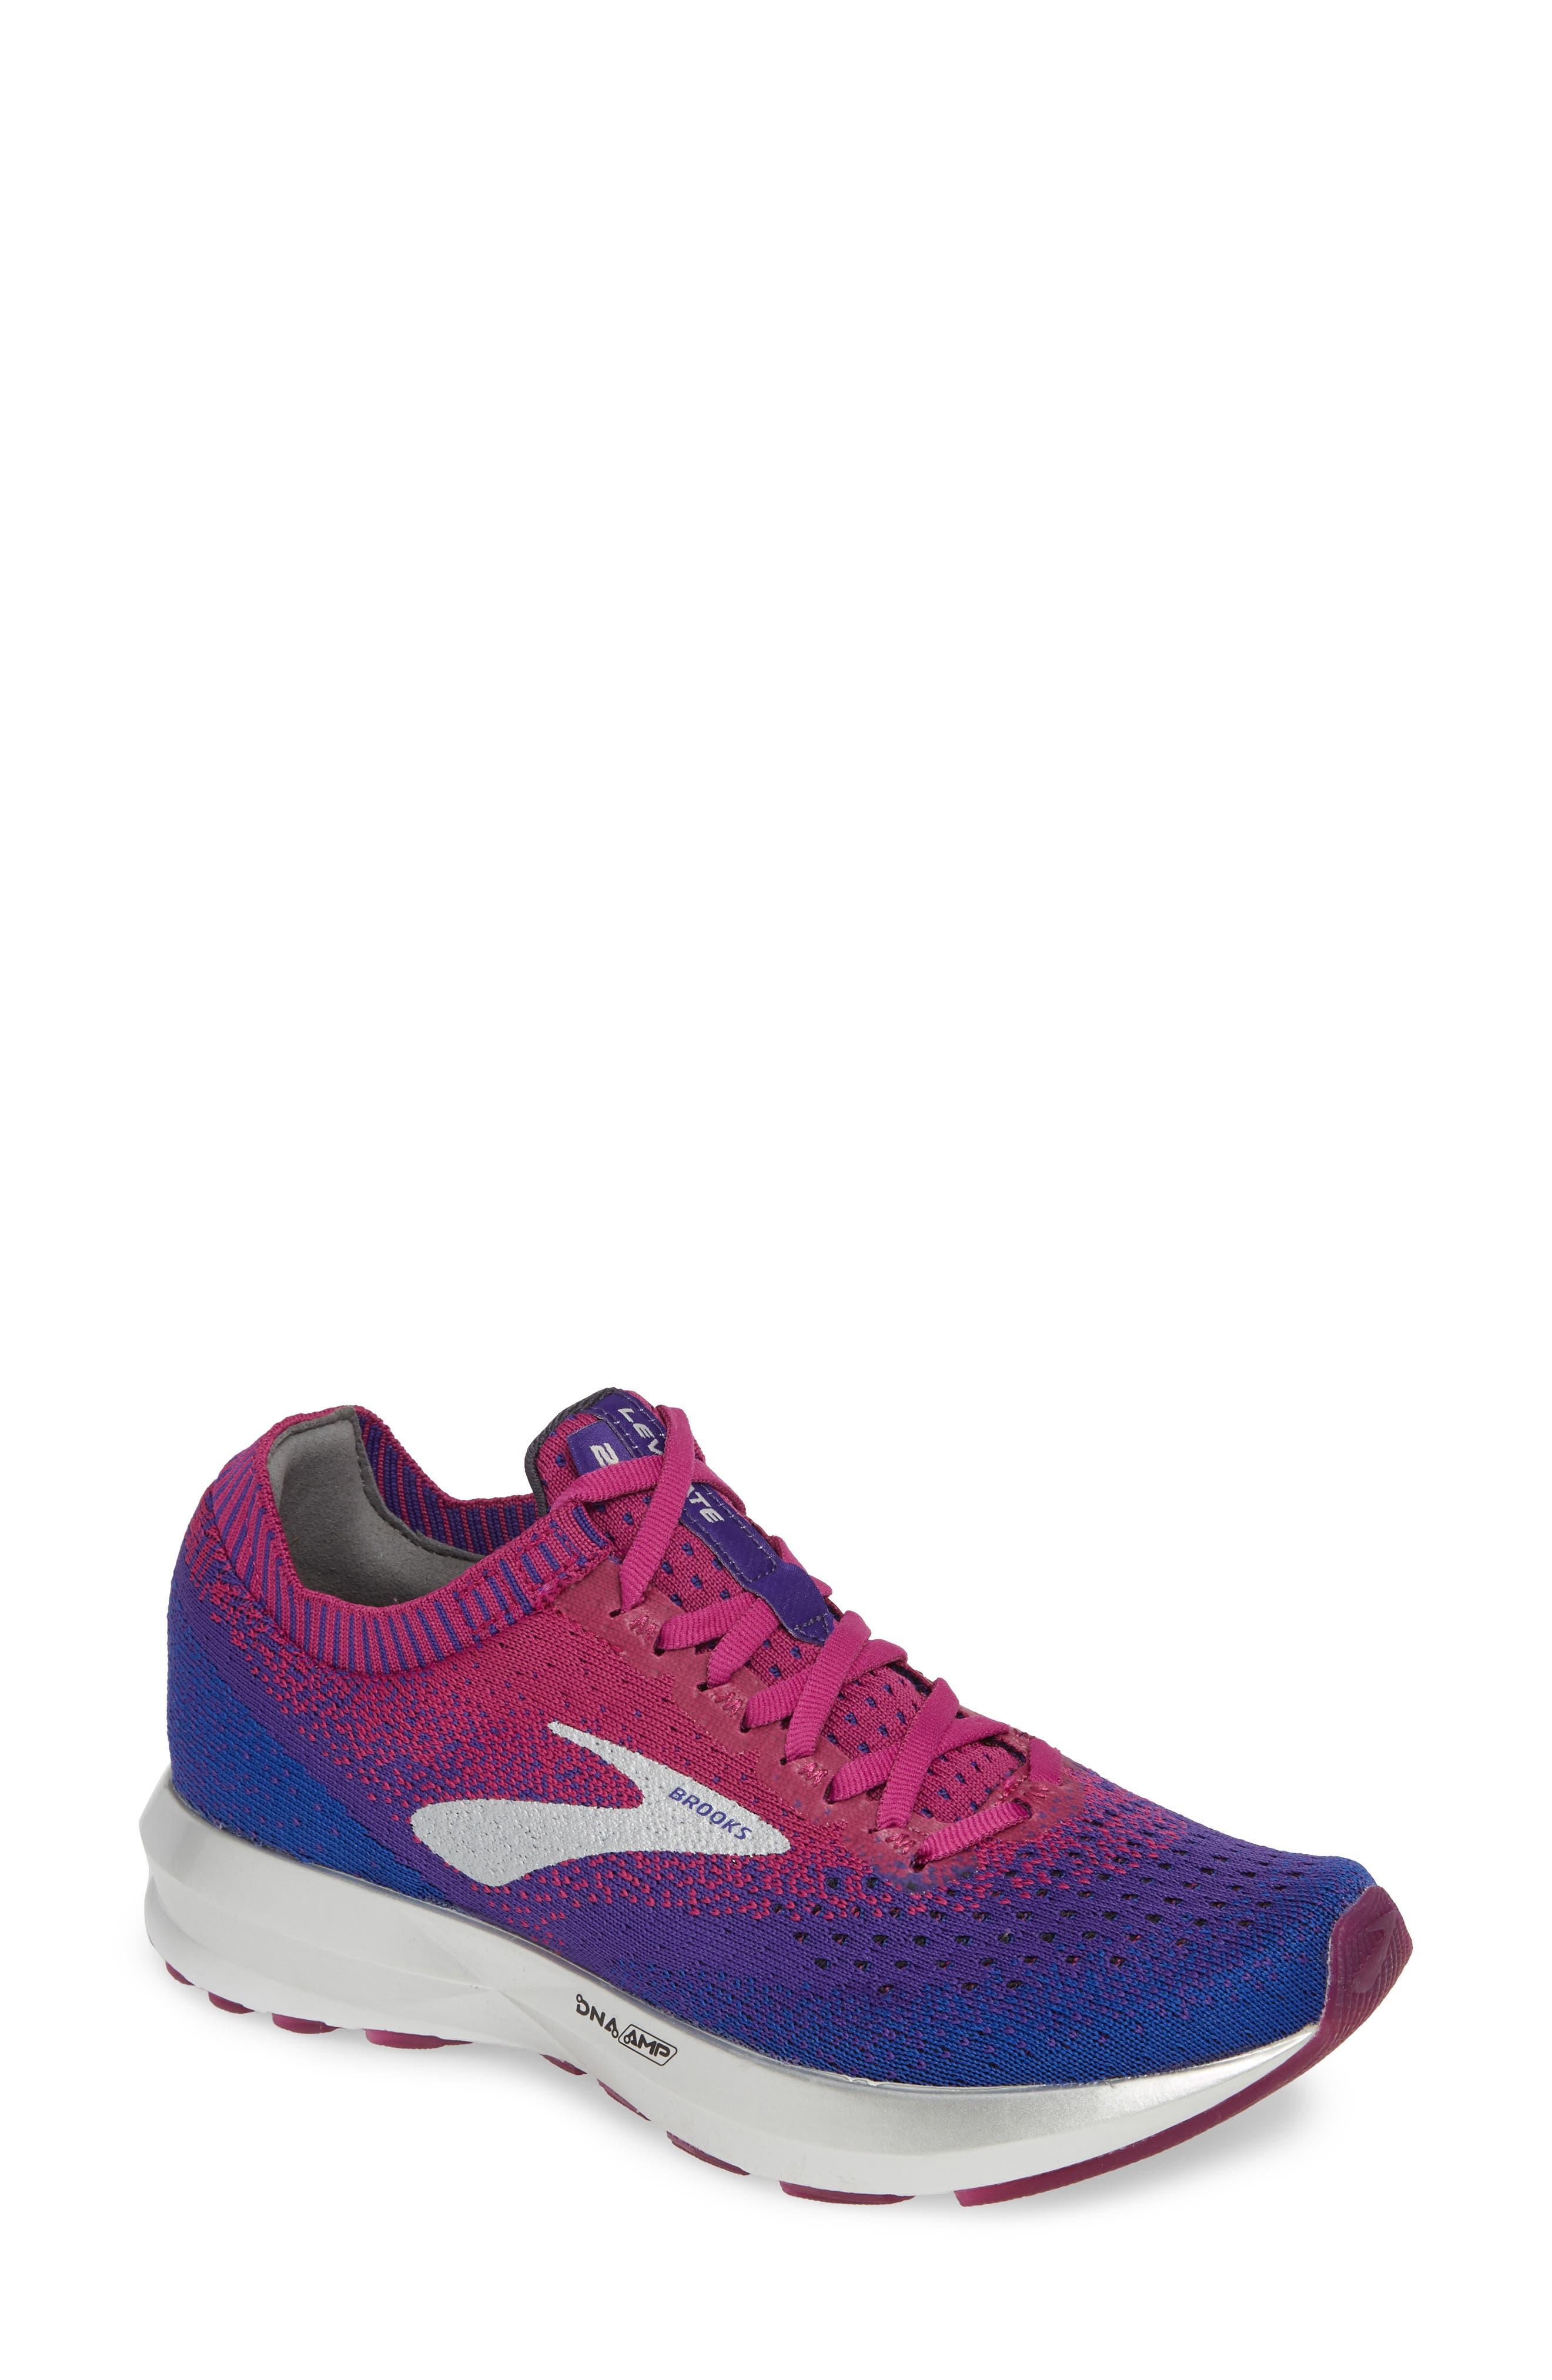 785cc5121e9 Grey Brooks for Women  Running Shoes